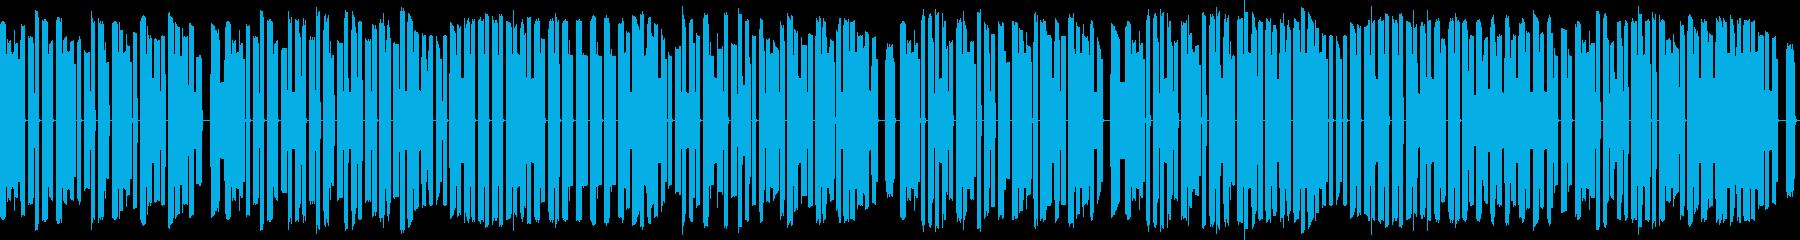 FC風音源による「一月一日」ですの再生済みの波形